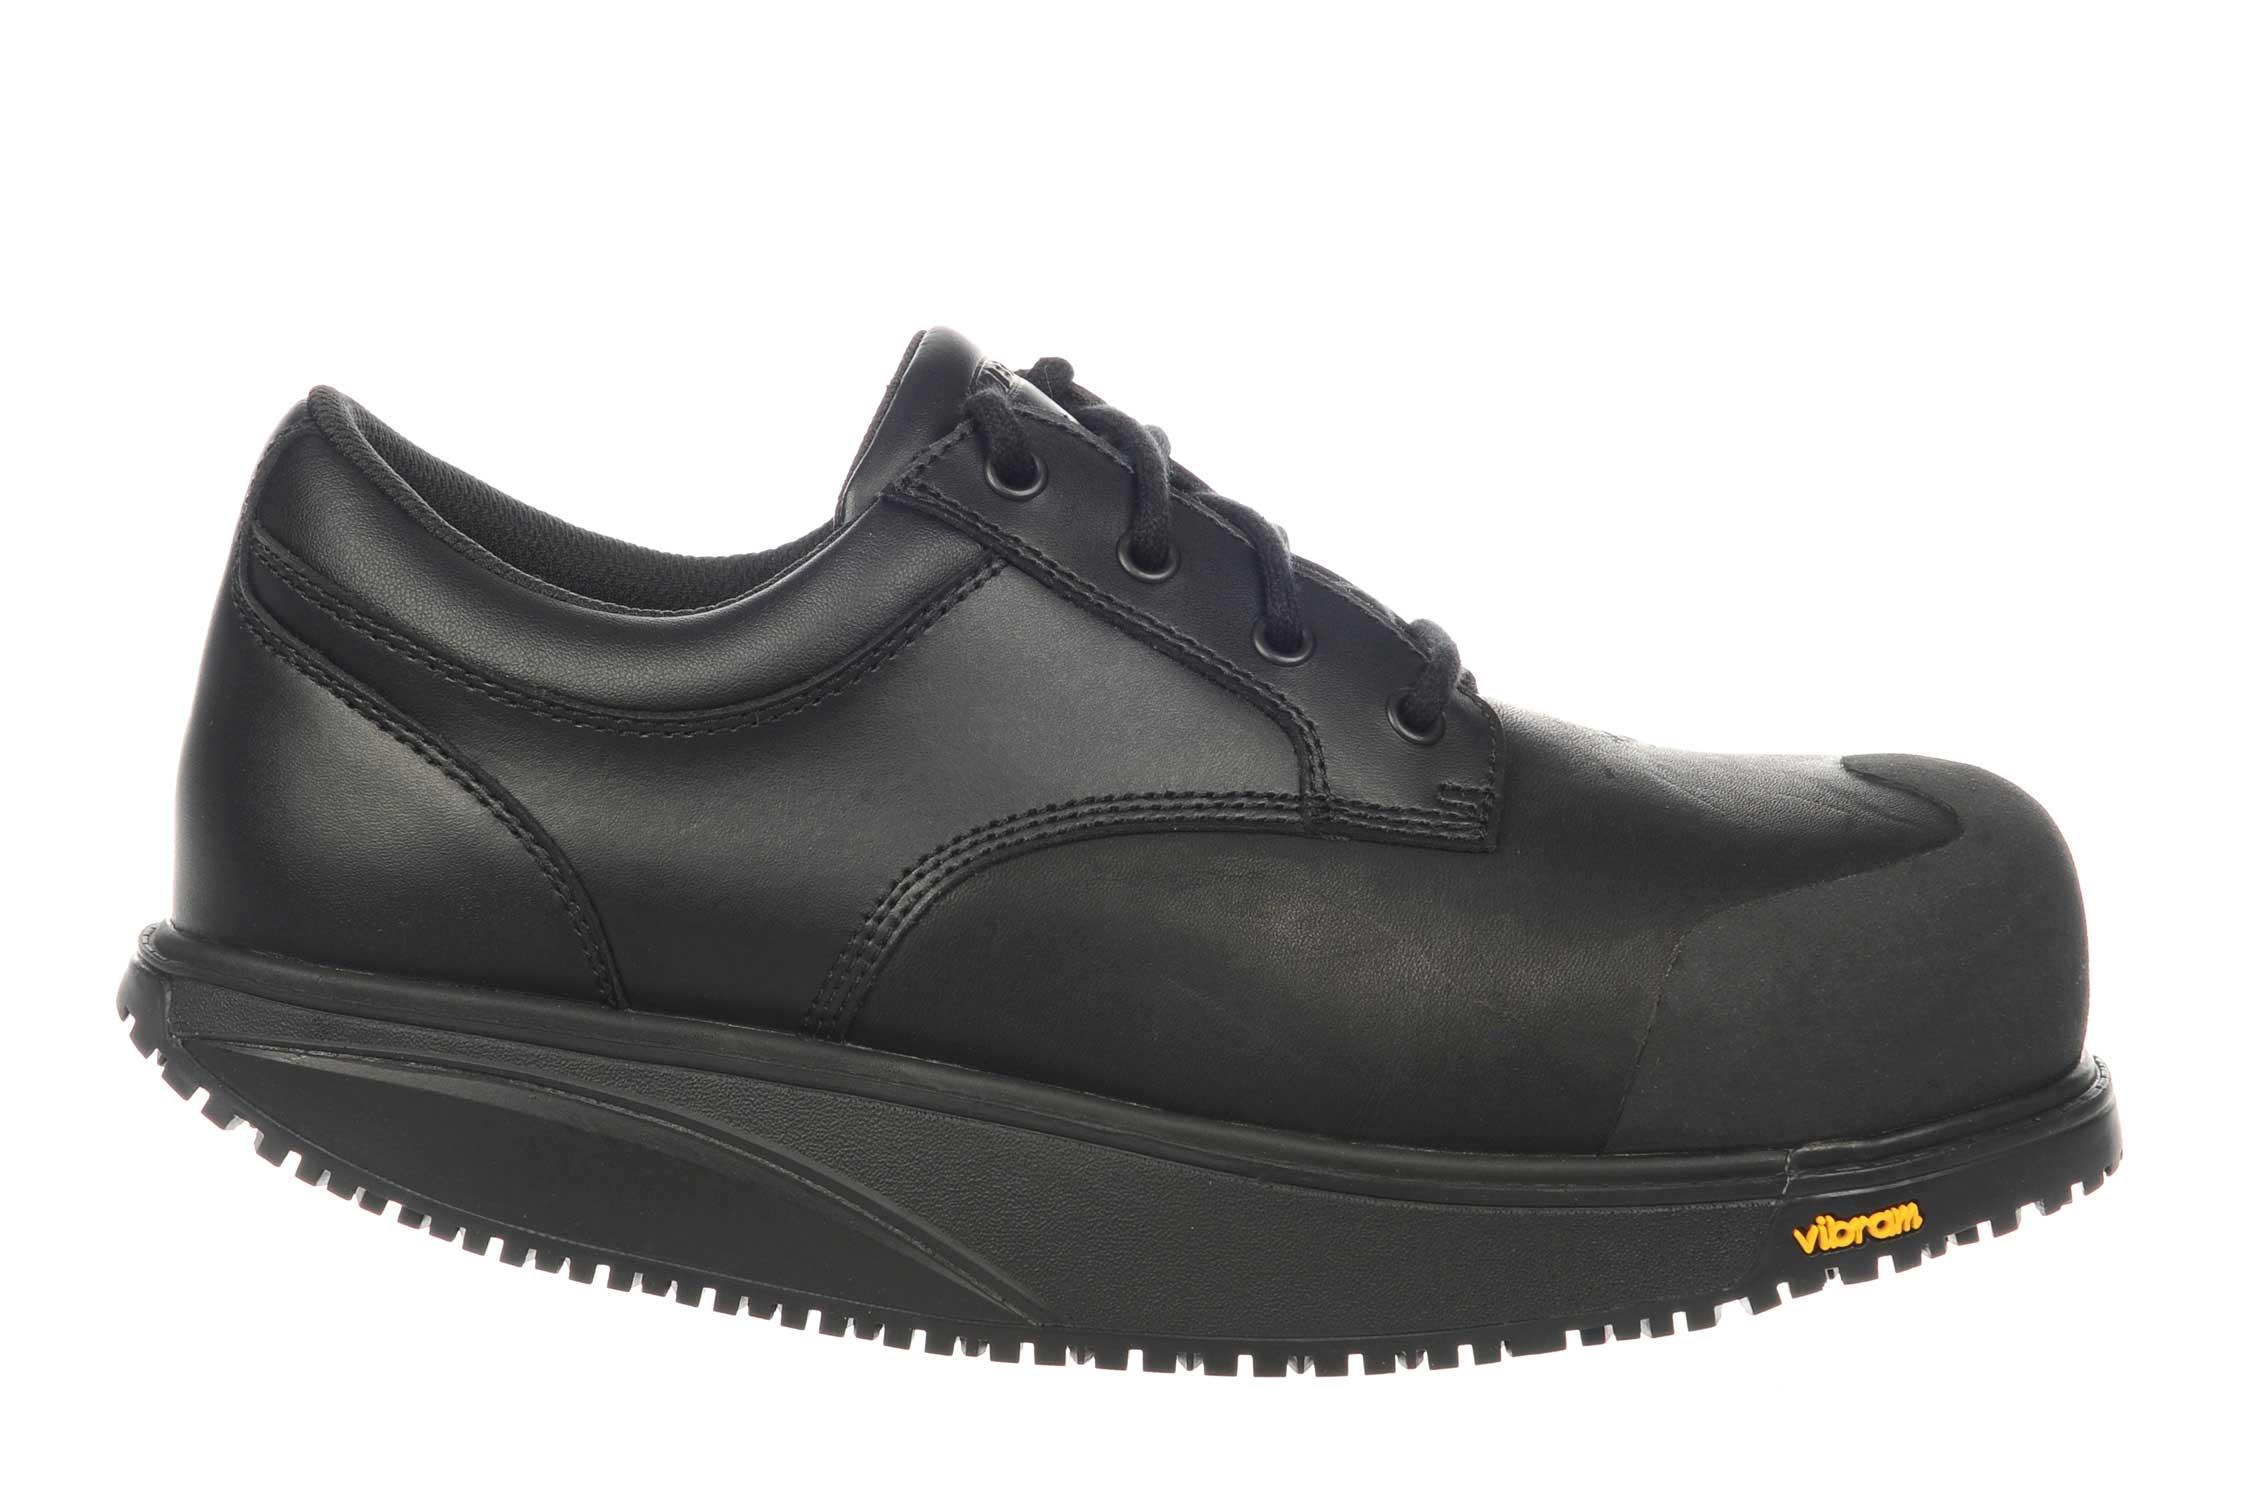 womens comforter amazon comfort on shoes slp ladies smart work co comfortable uk black slip for loafers size